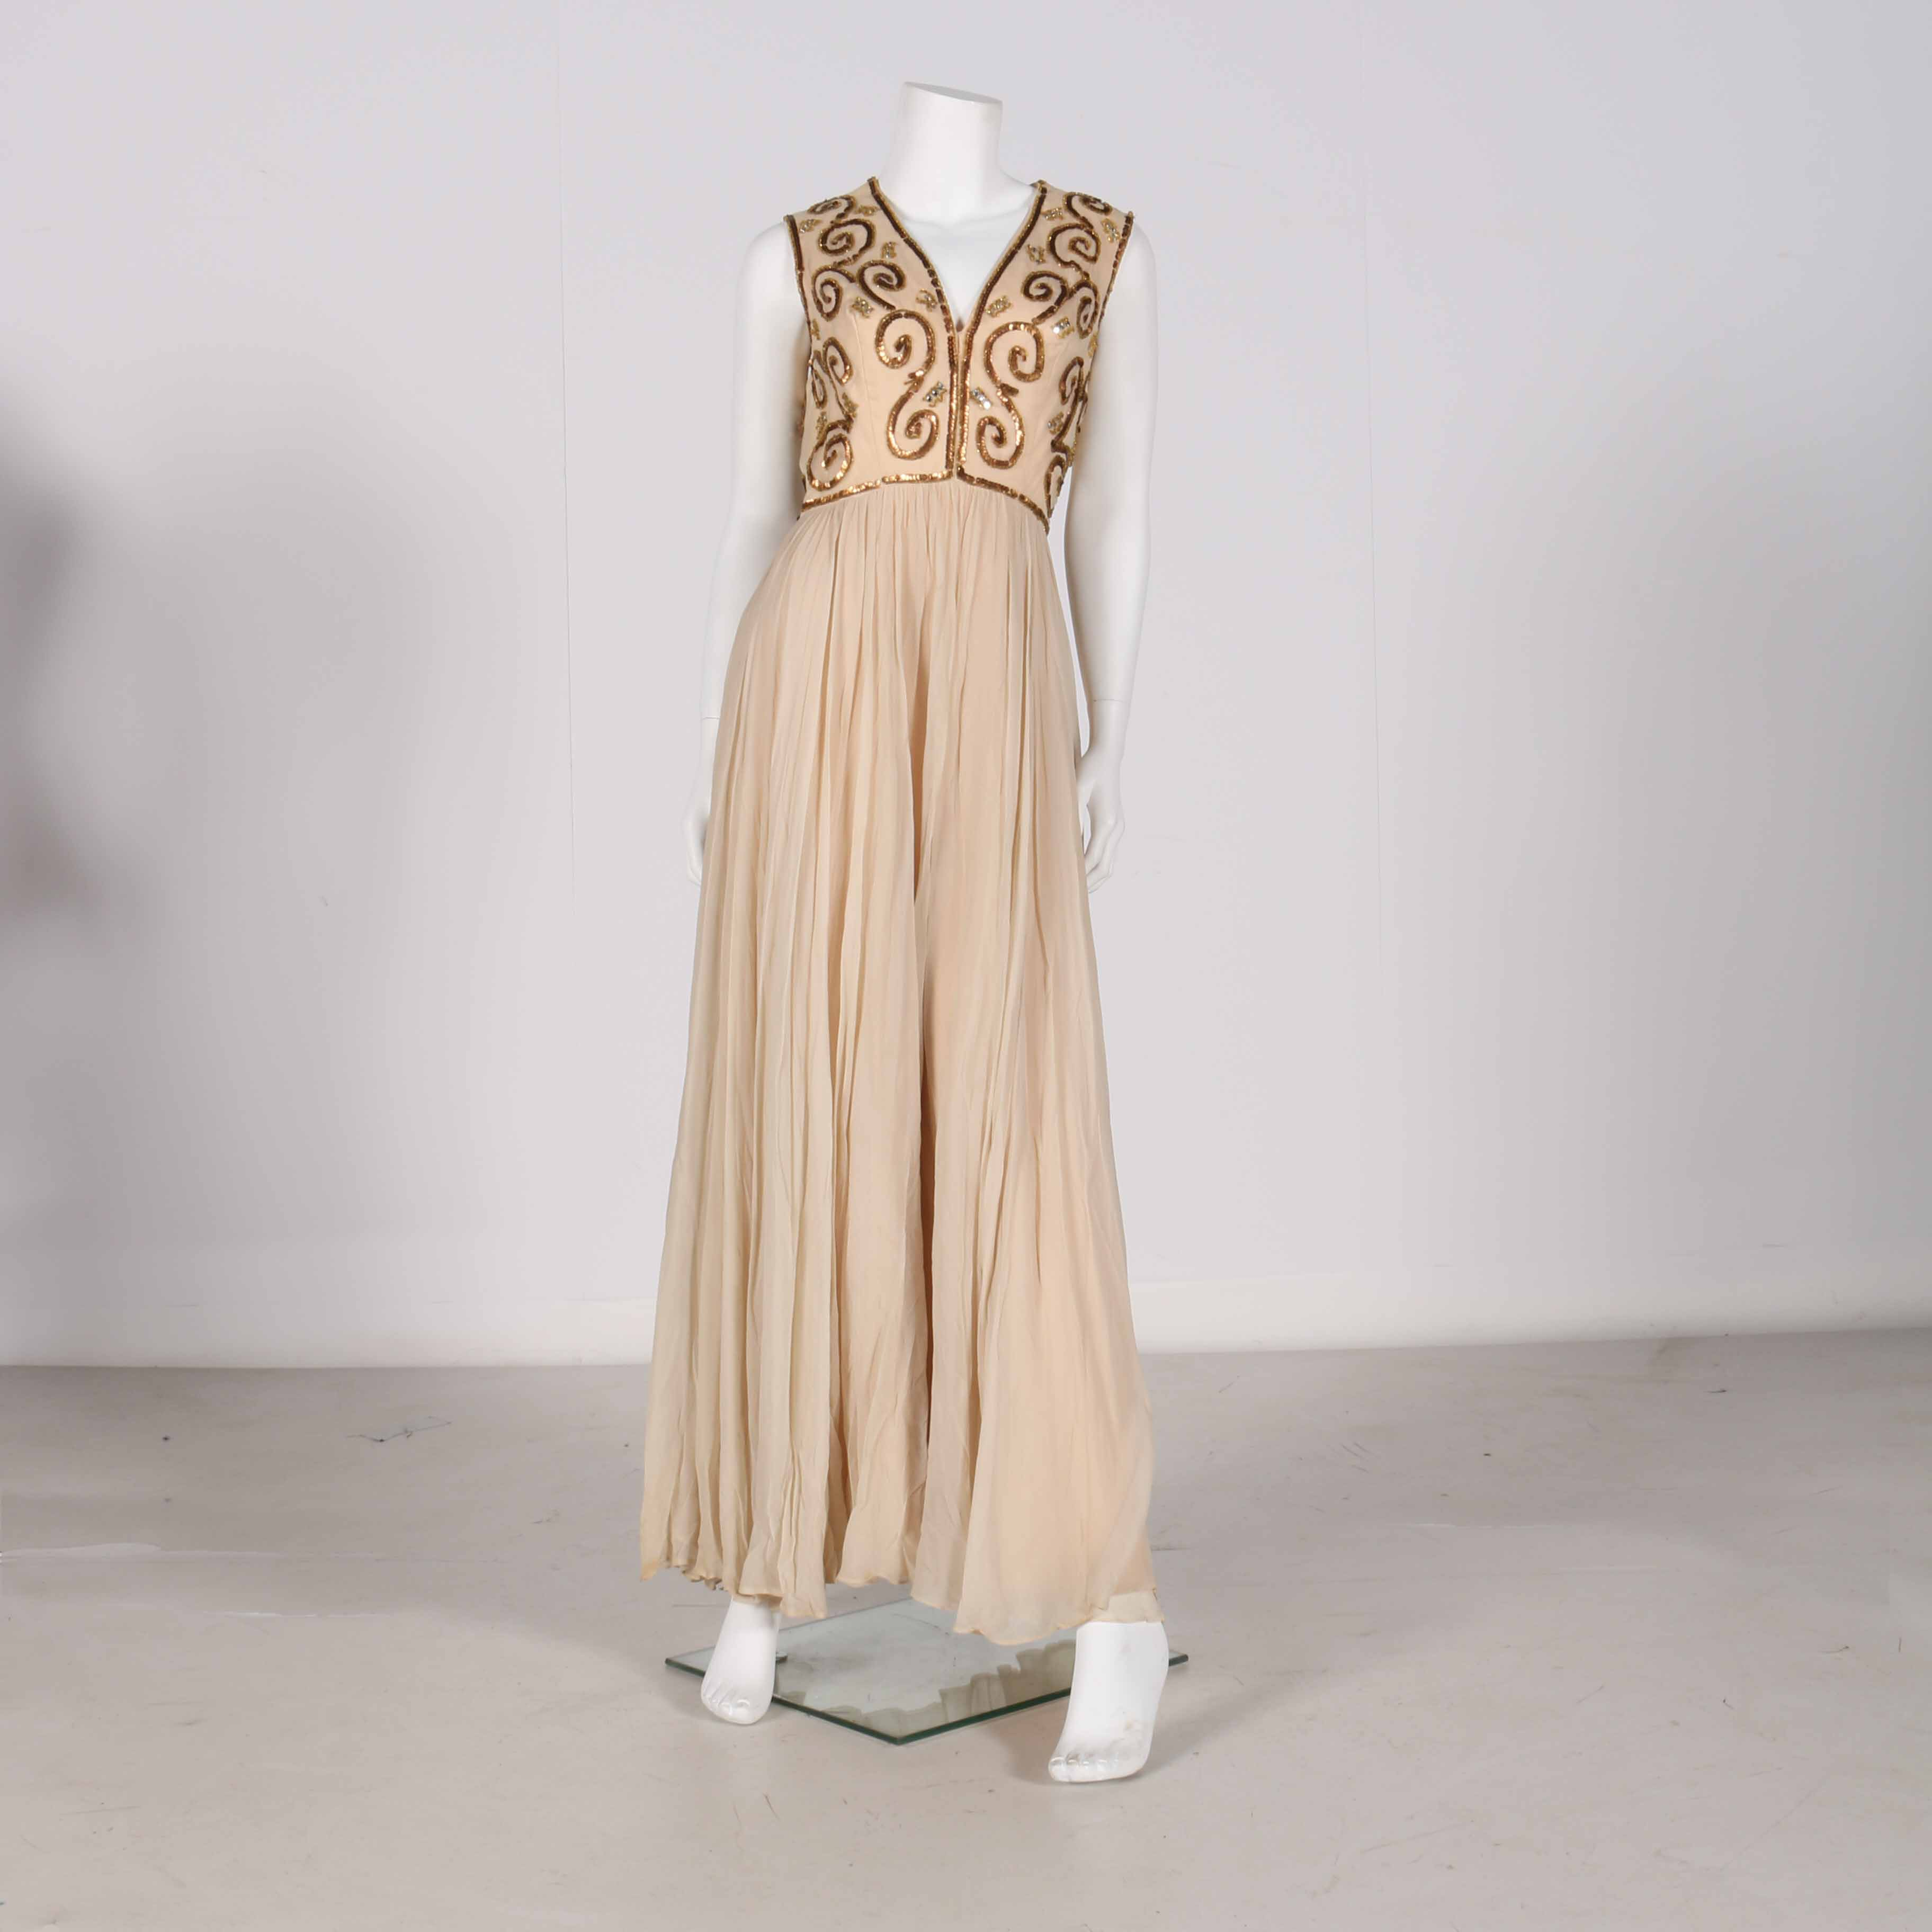 Circa 1970s Saks Fifth Avenue Beaded Evening Gown Ebth